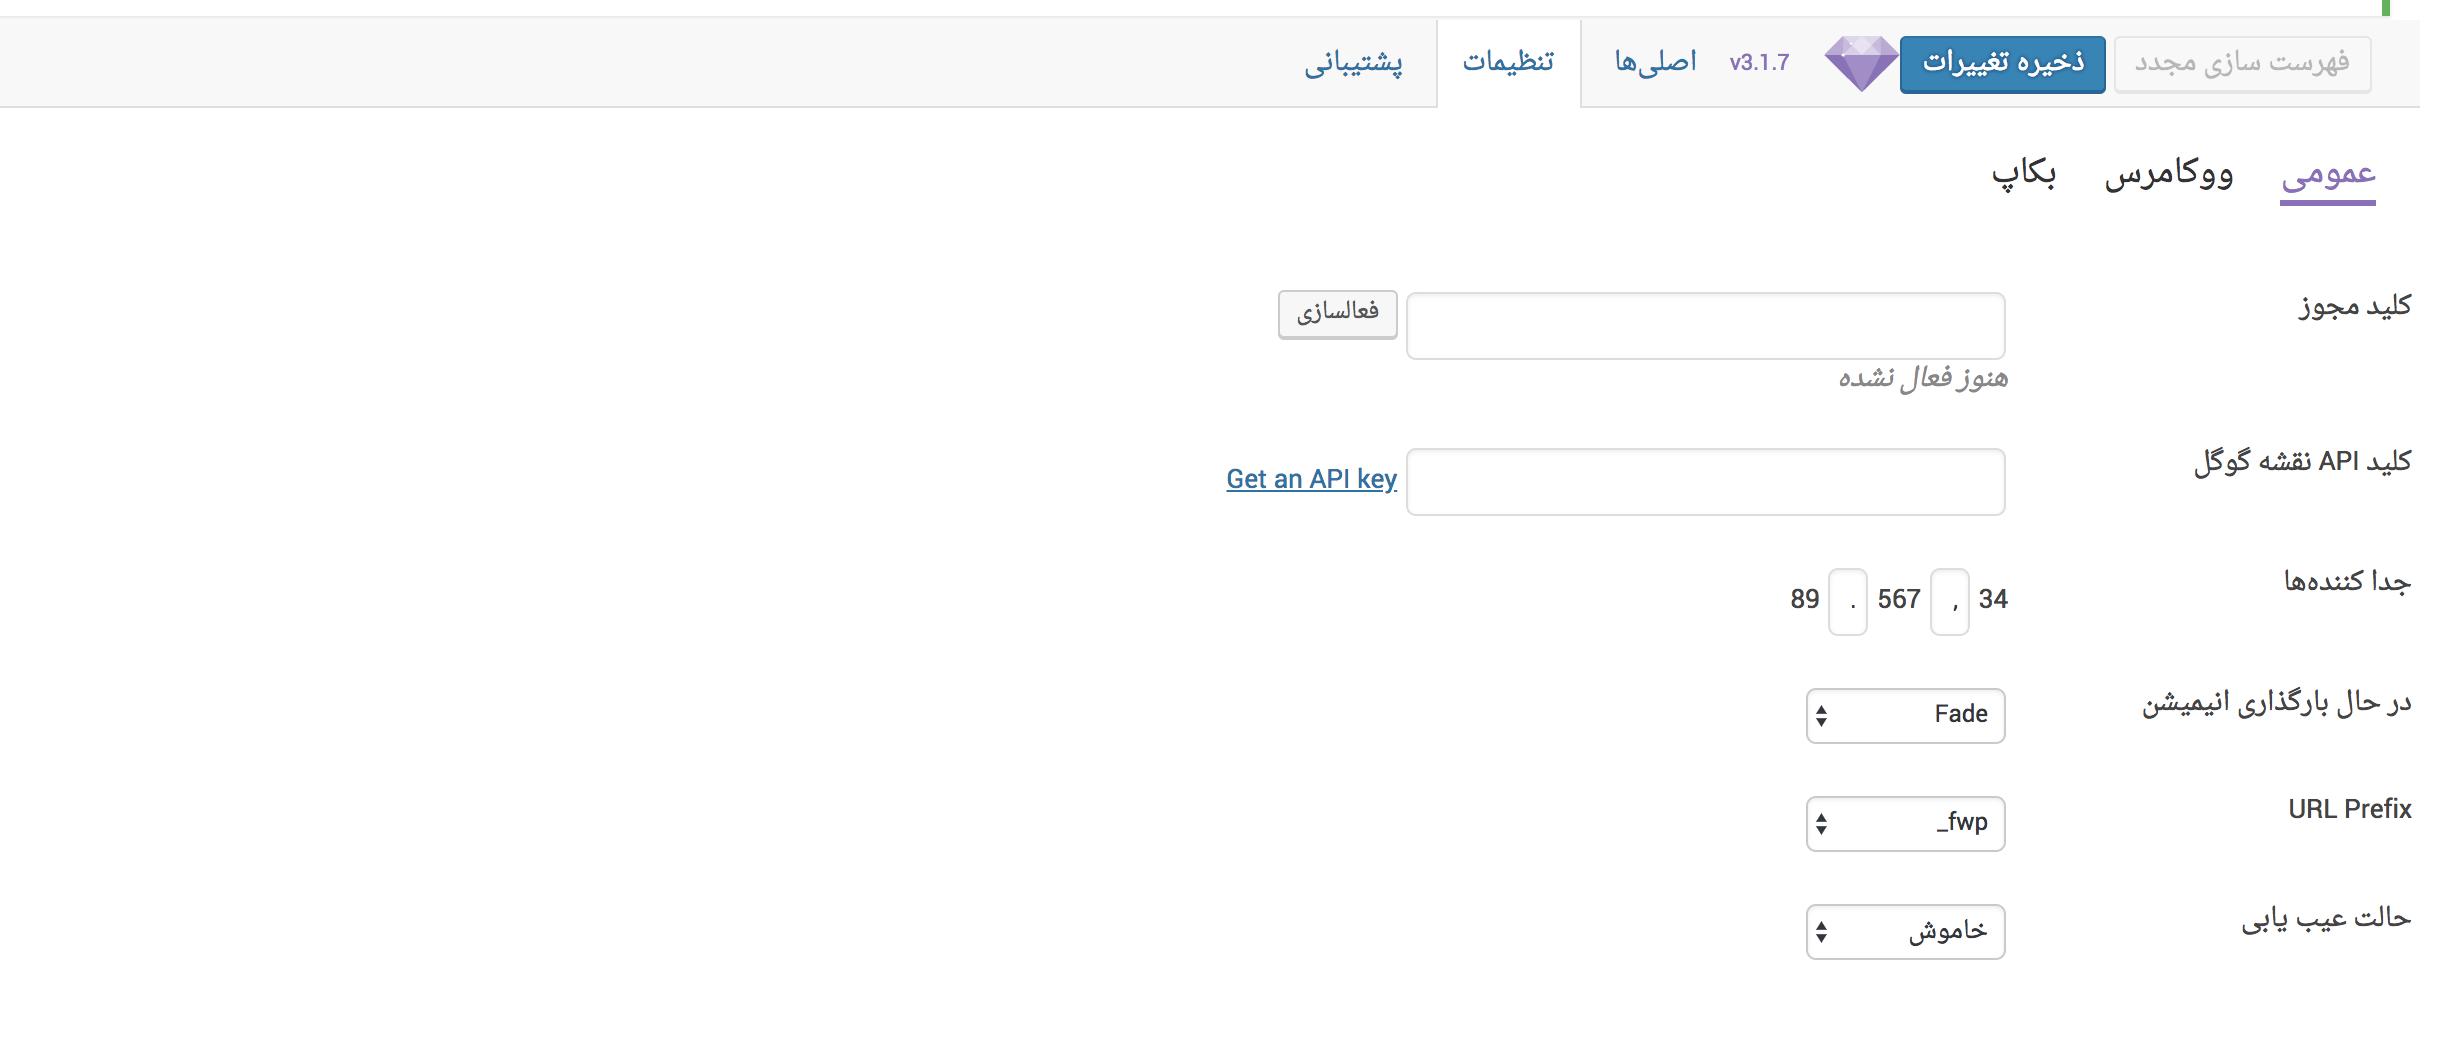 افزونه جستجوی پیشرفته وردپرس facetwp به همراه ضمیمهها 1